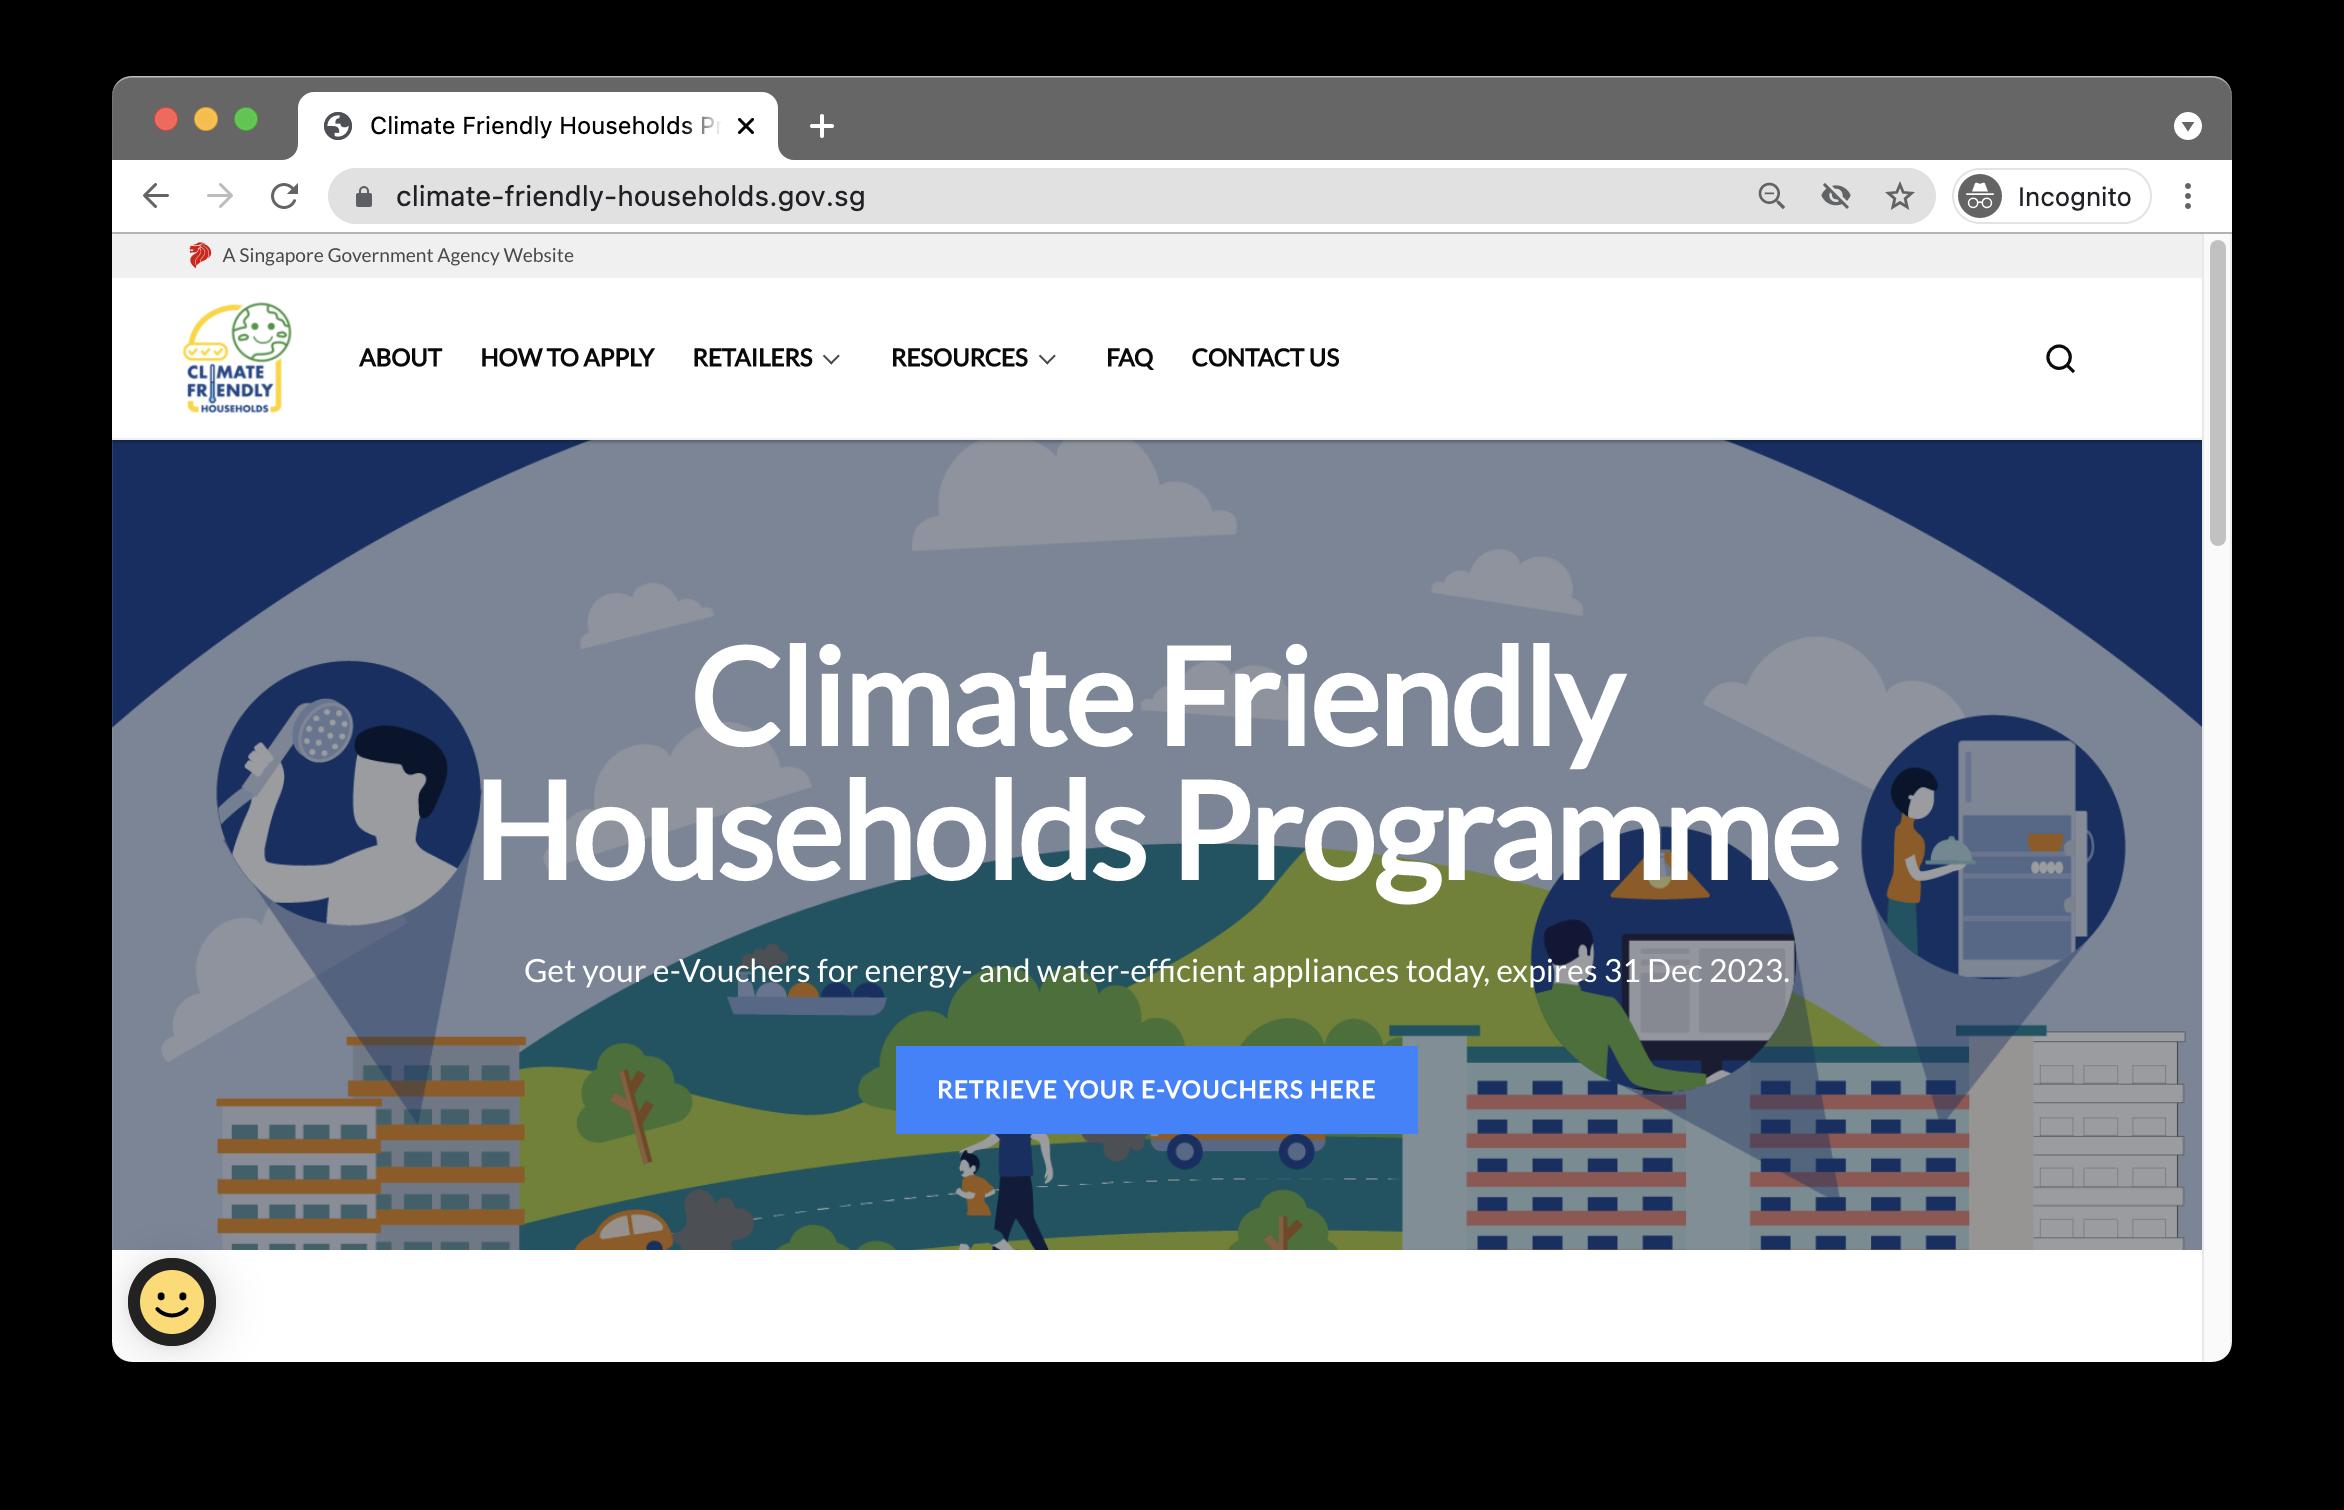 NEA/PUB Climate Friendly Households Programme